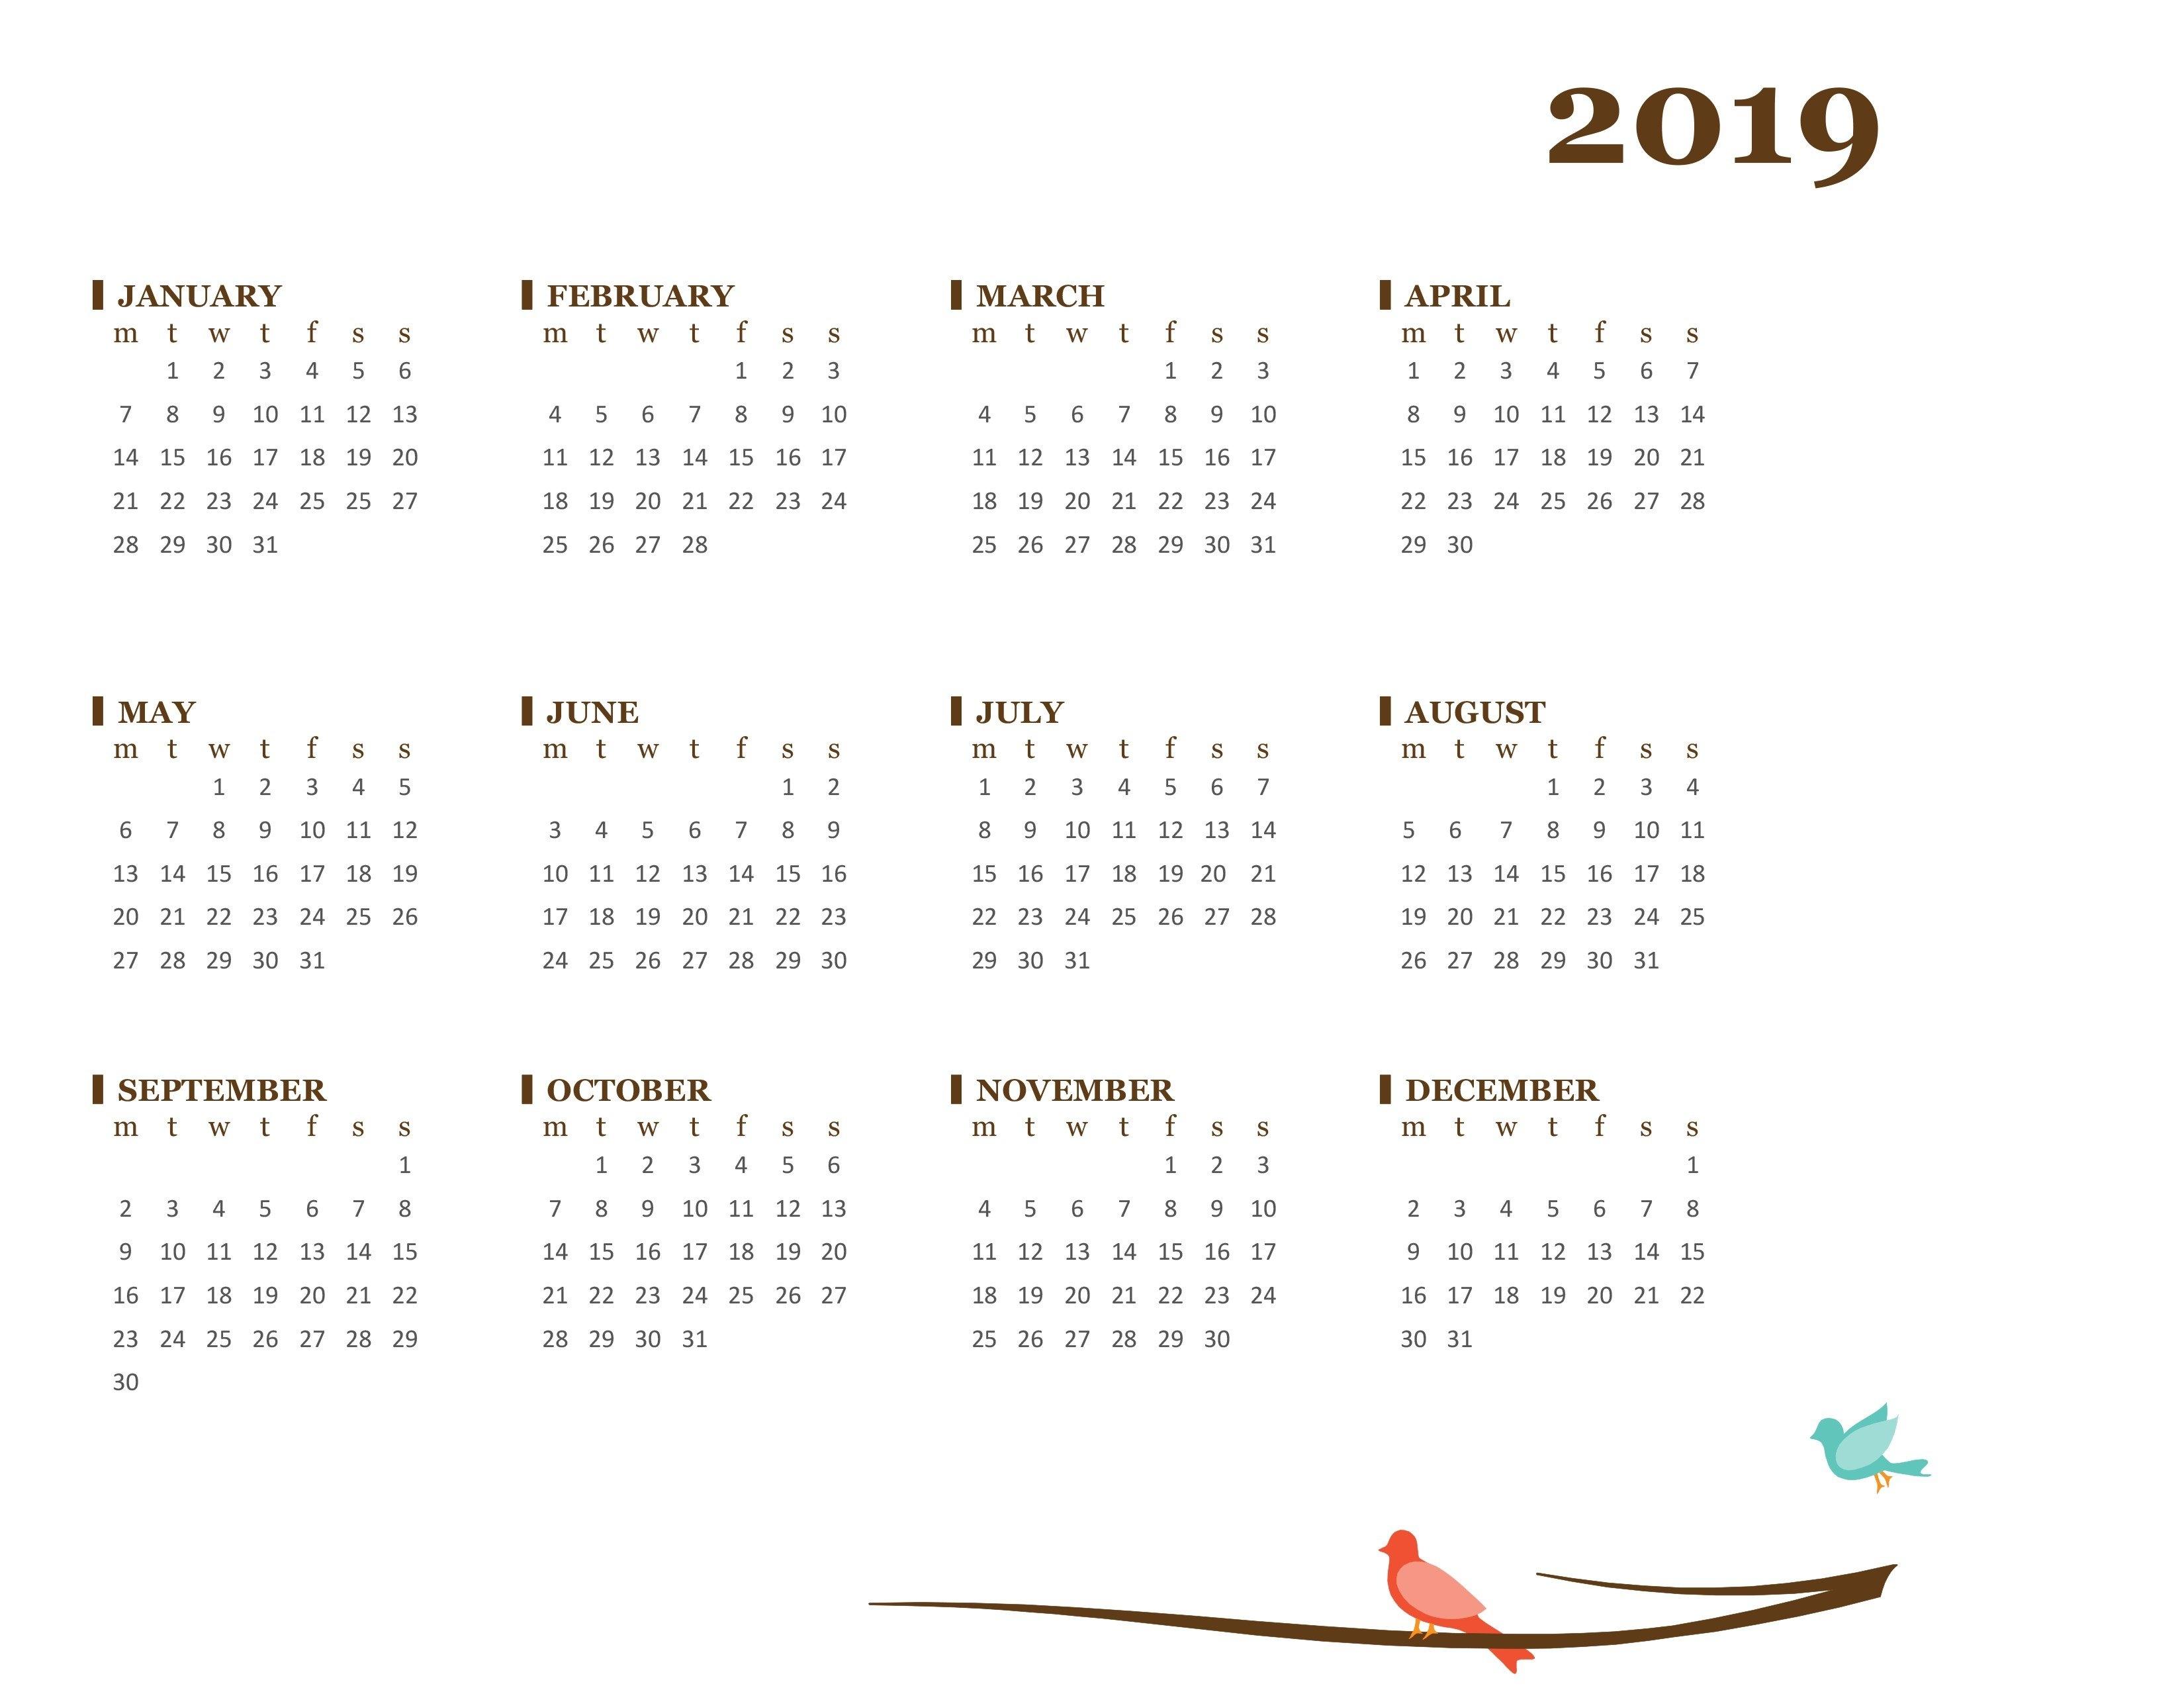 2019 Yearly Calendar (Mon Sun) Images Of A 2019 Calendar